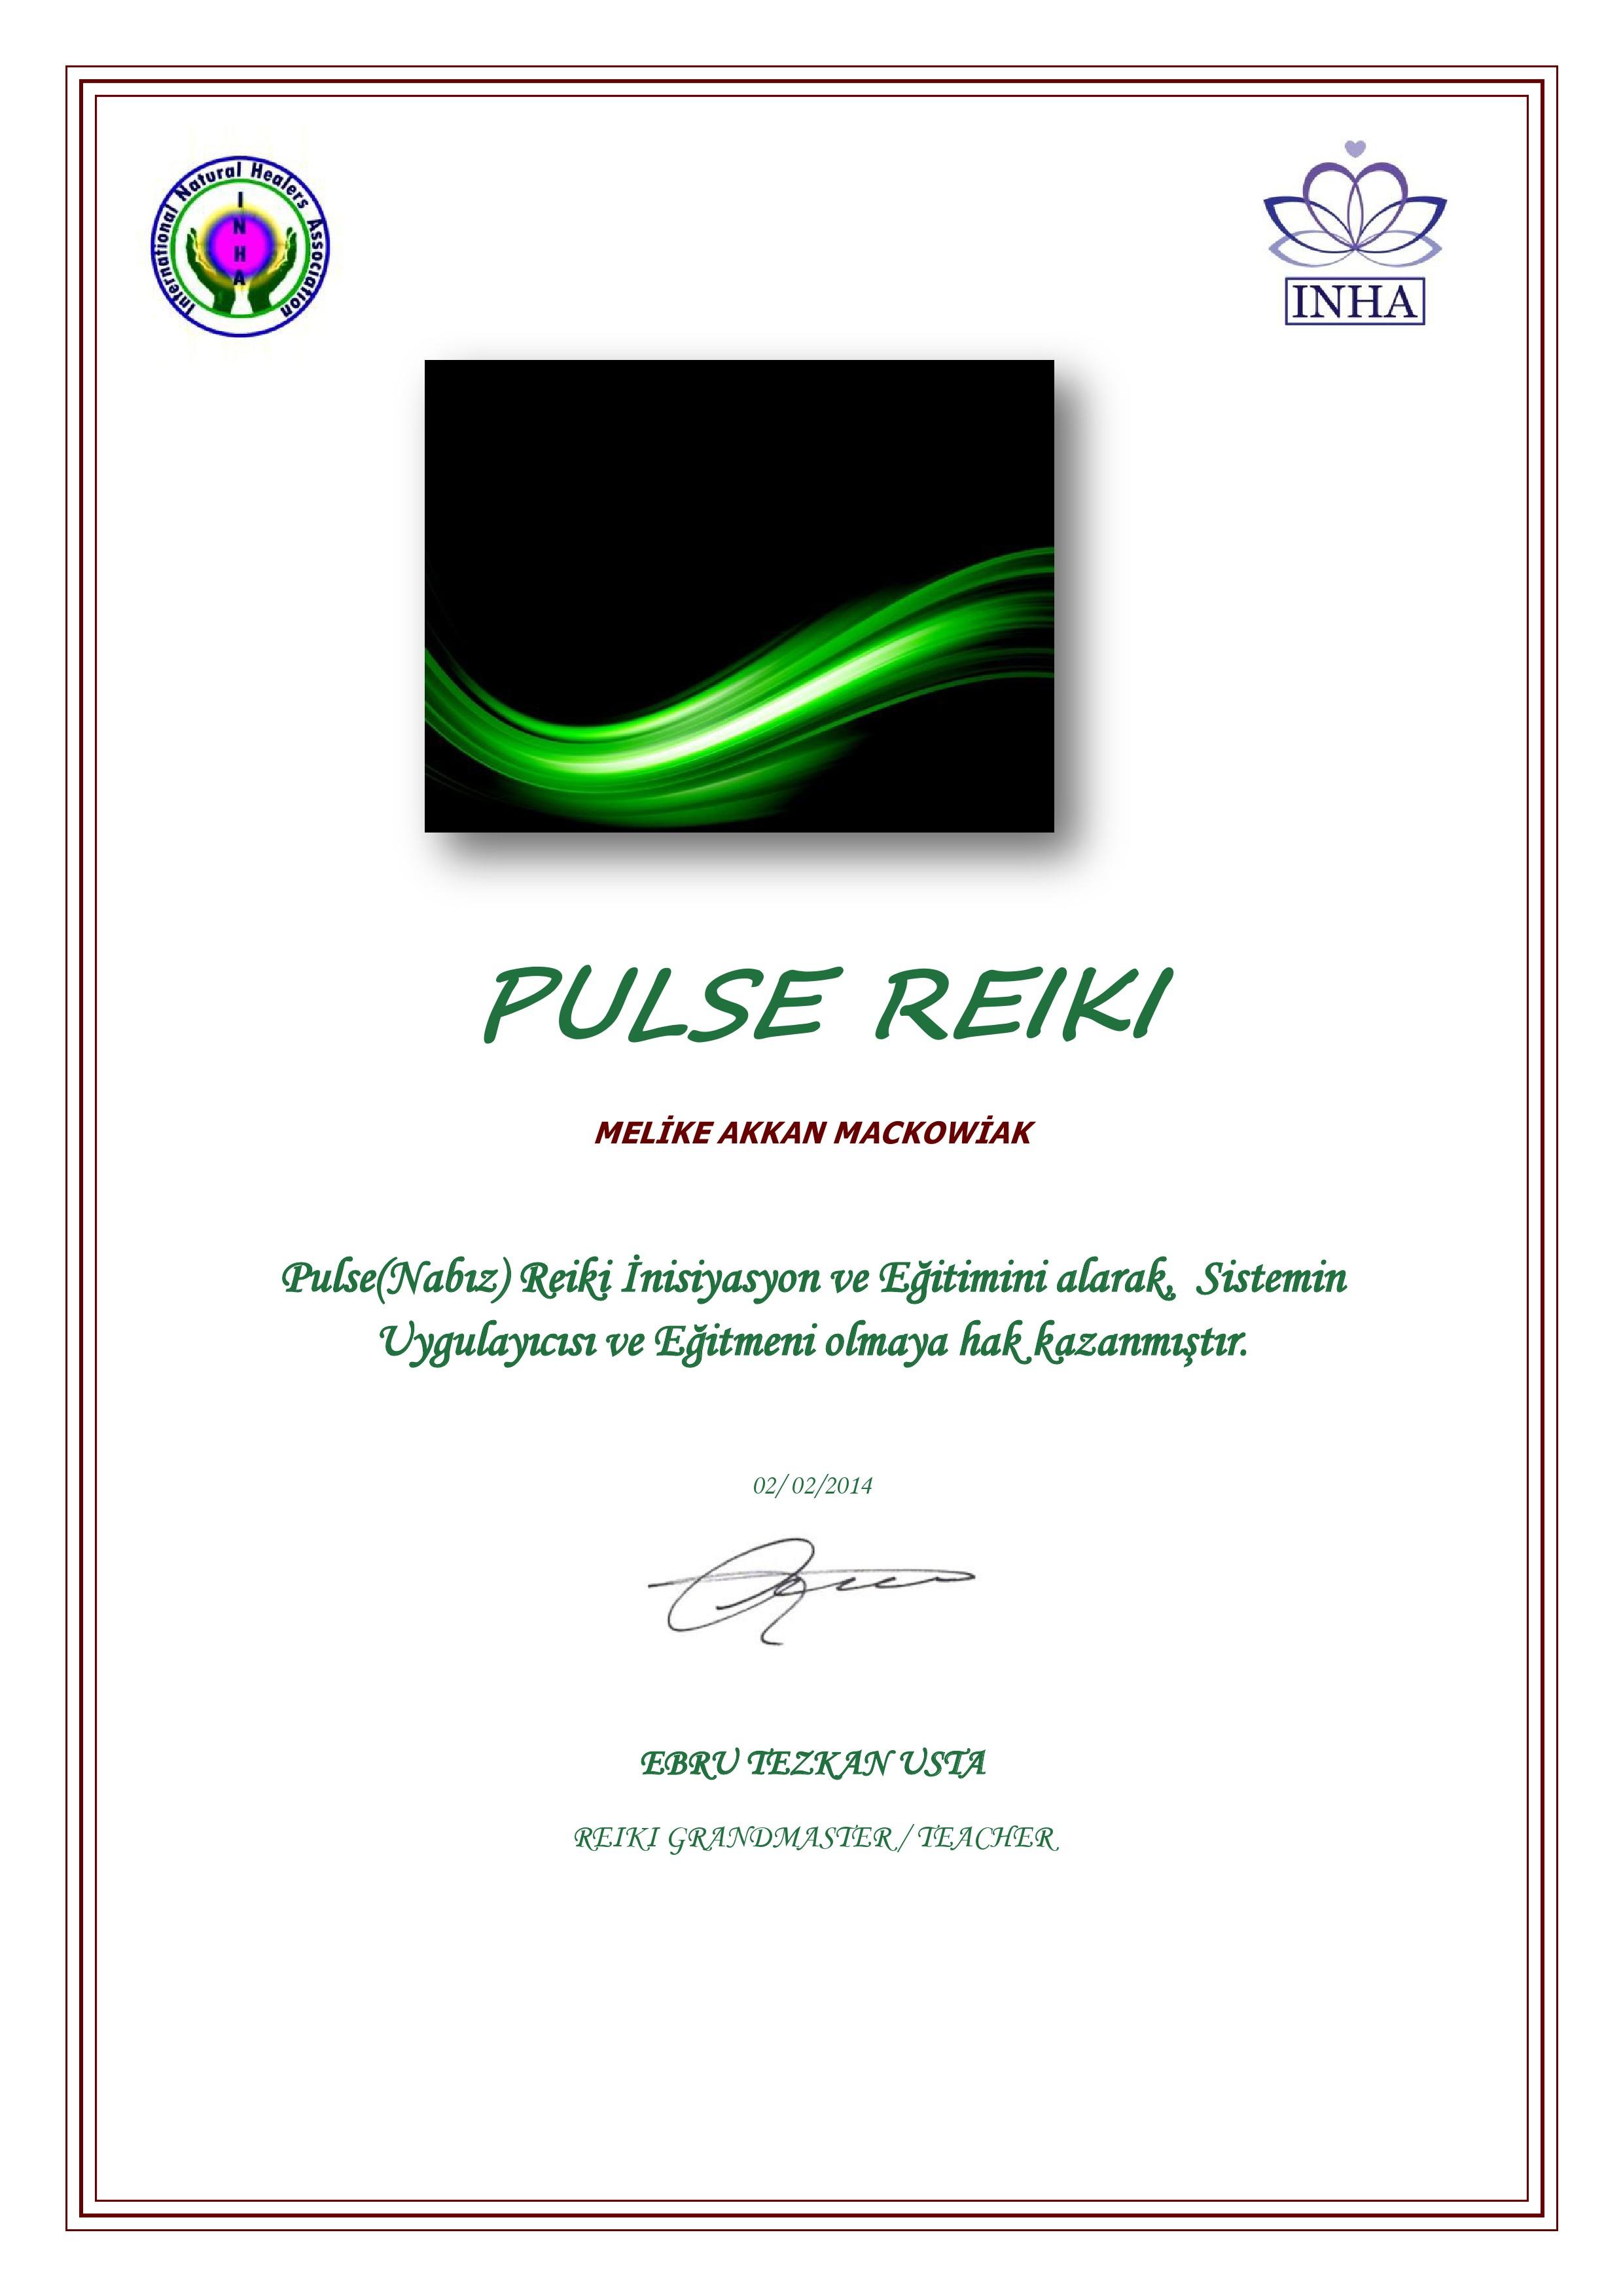 PULSE (NABIZ) REİKİ SERTİFİKA -1